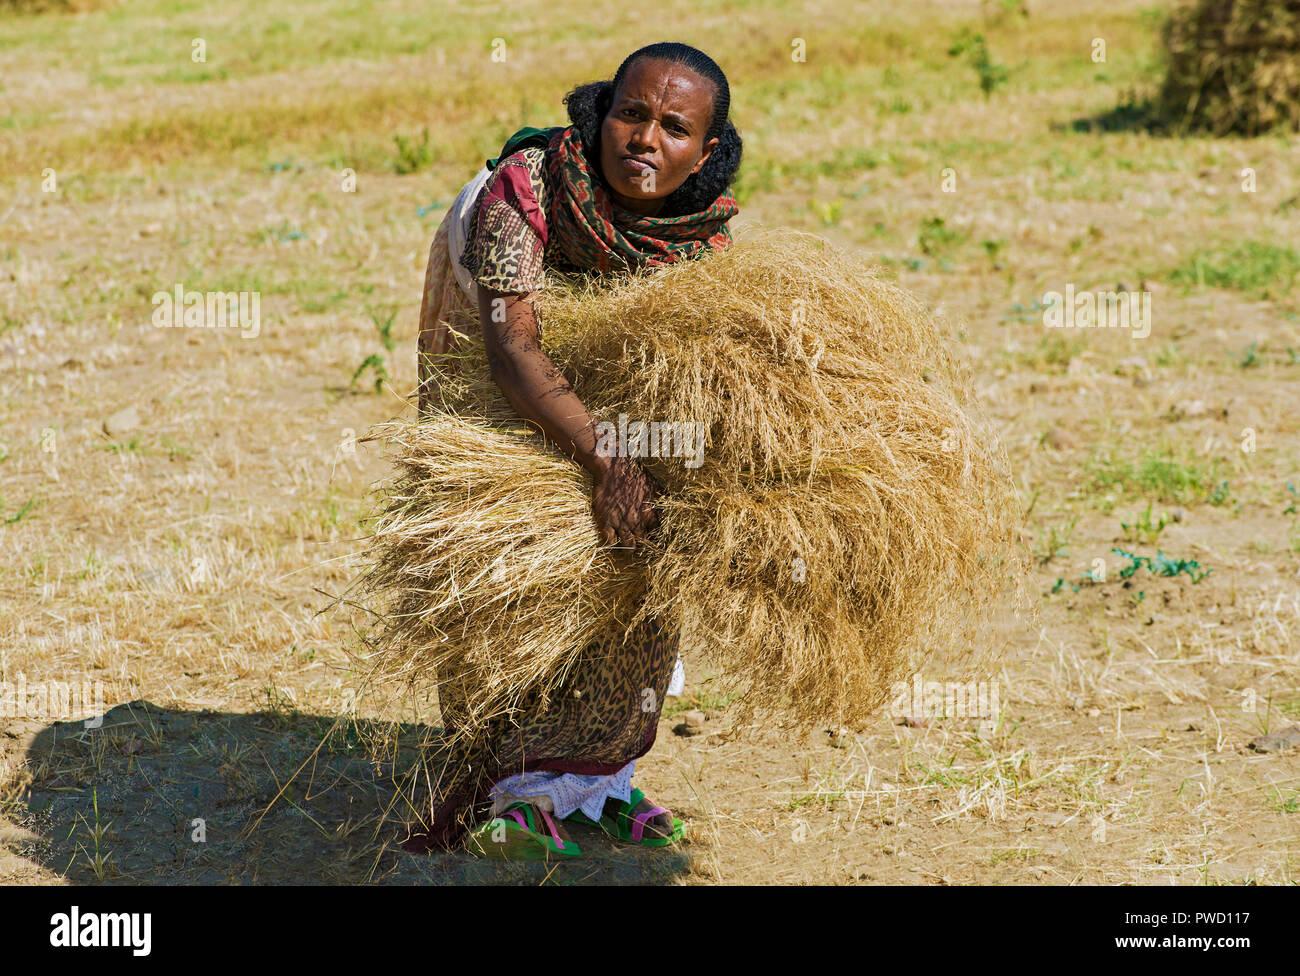 Local farmer woman collecting sheaves of Teff (Eragrostis tef) for threshing, Hawzien, Tigray, Ethiopia - Stock Image